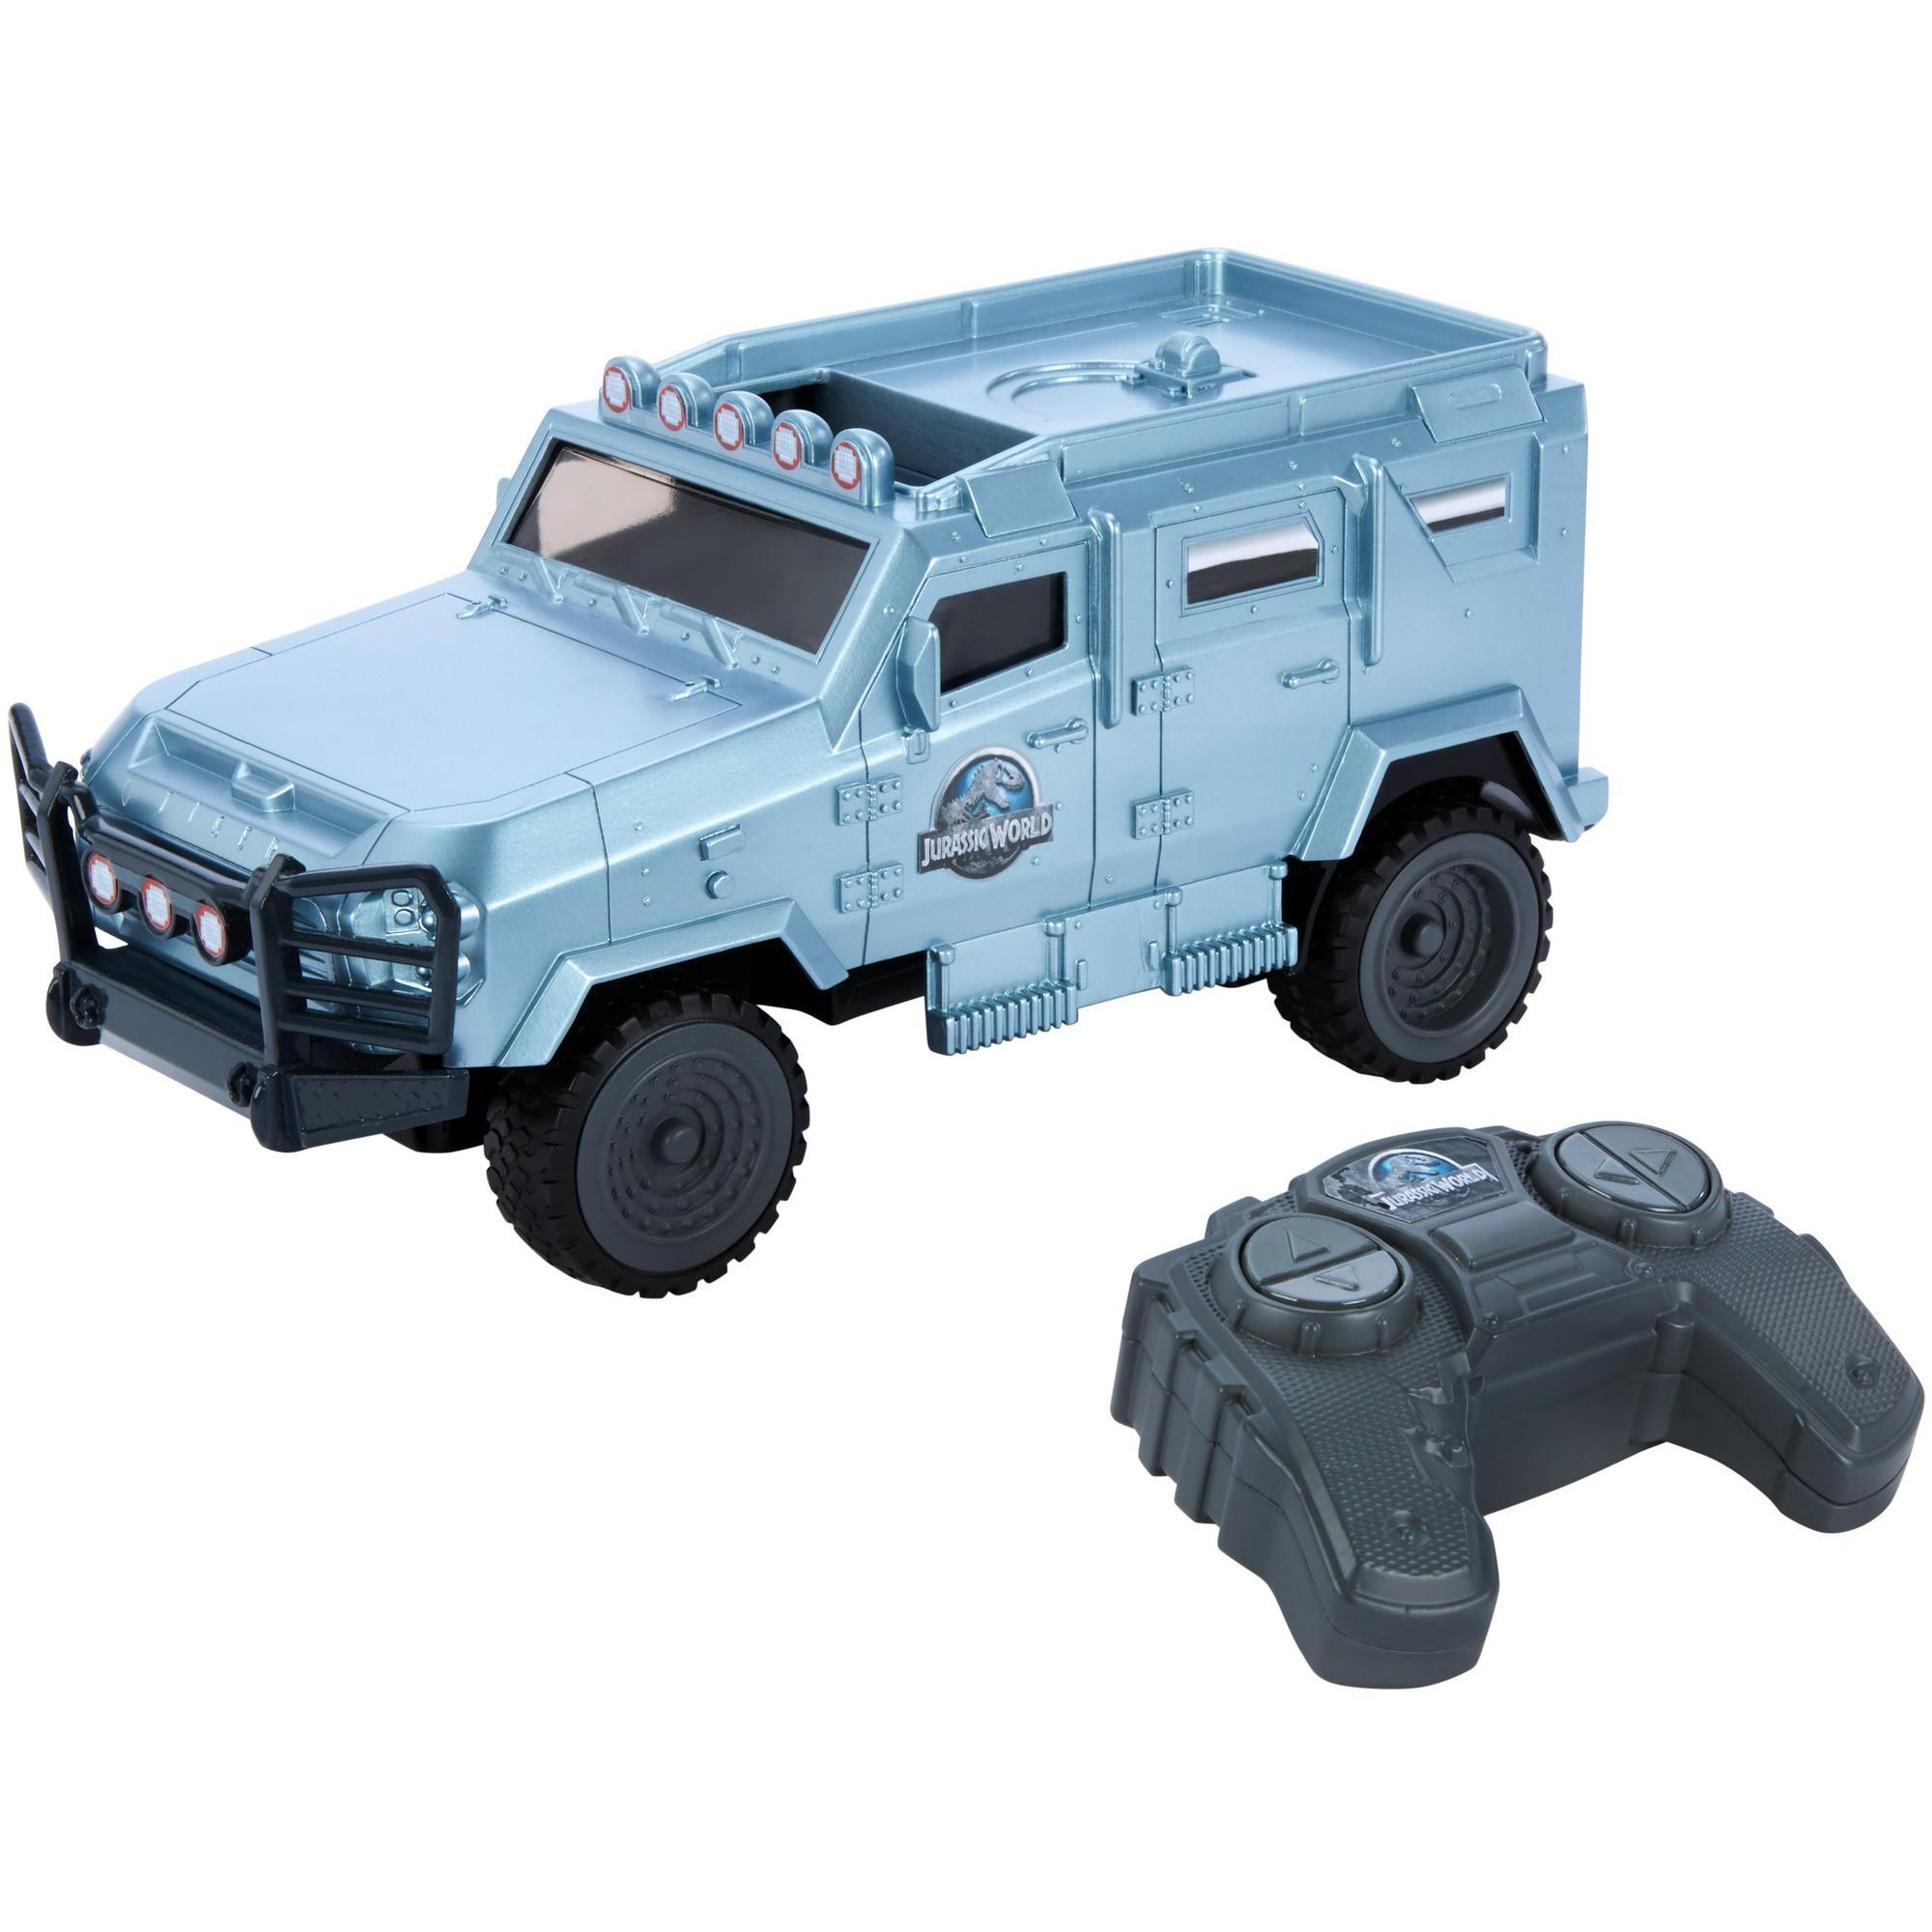 Matchbox Jurassic World MDT Tiger Light Protected RC Vehicle by Mattel